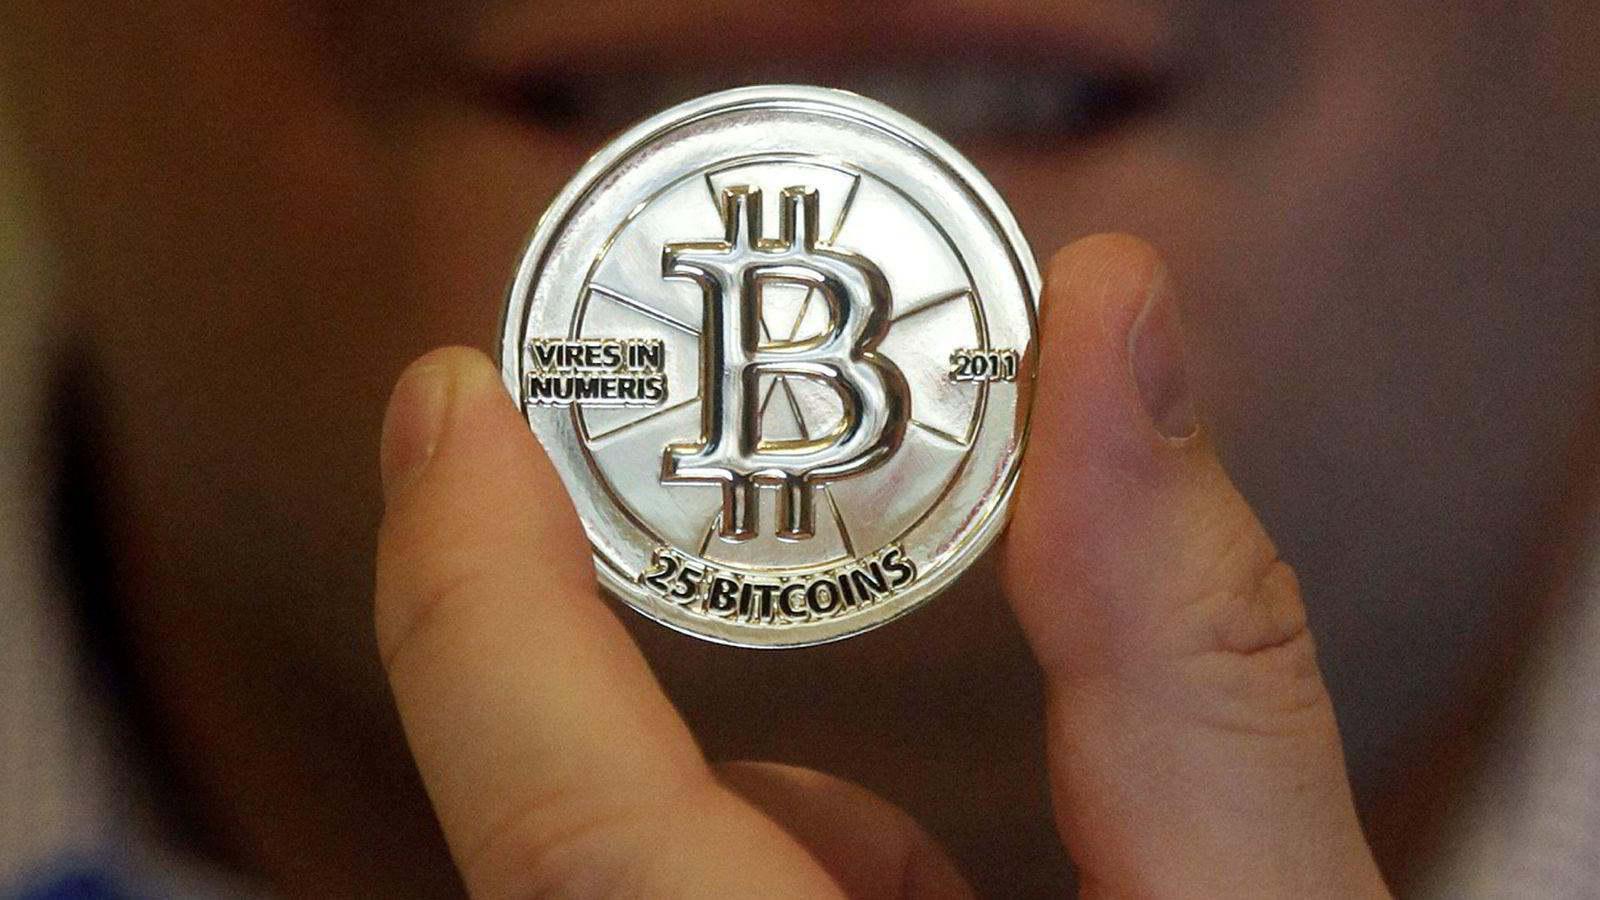 Bitcoin har steget med over 1500 prosent så langt i år.